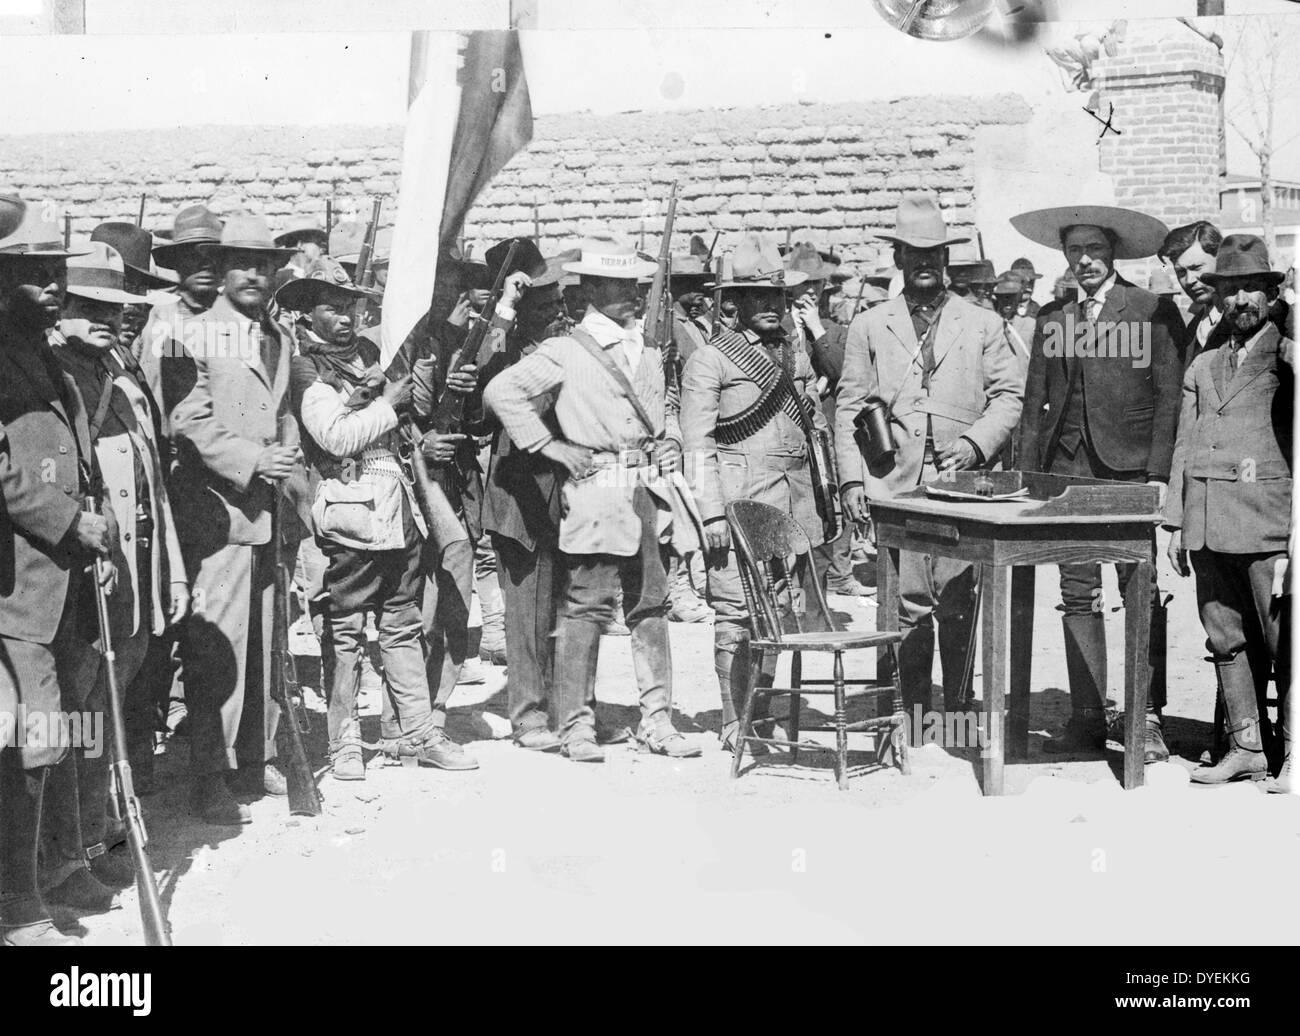 Fotos de la revolucion mexicana de 1910 82